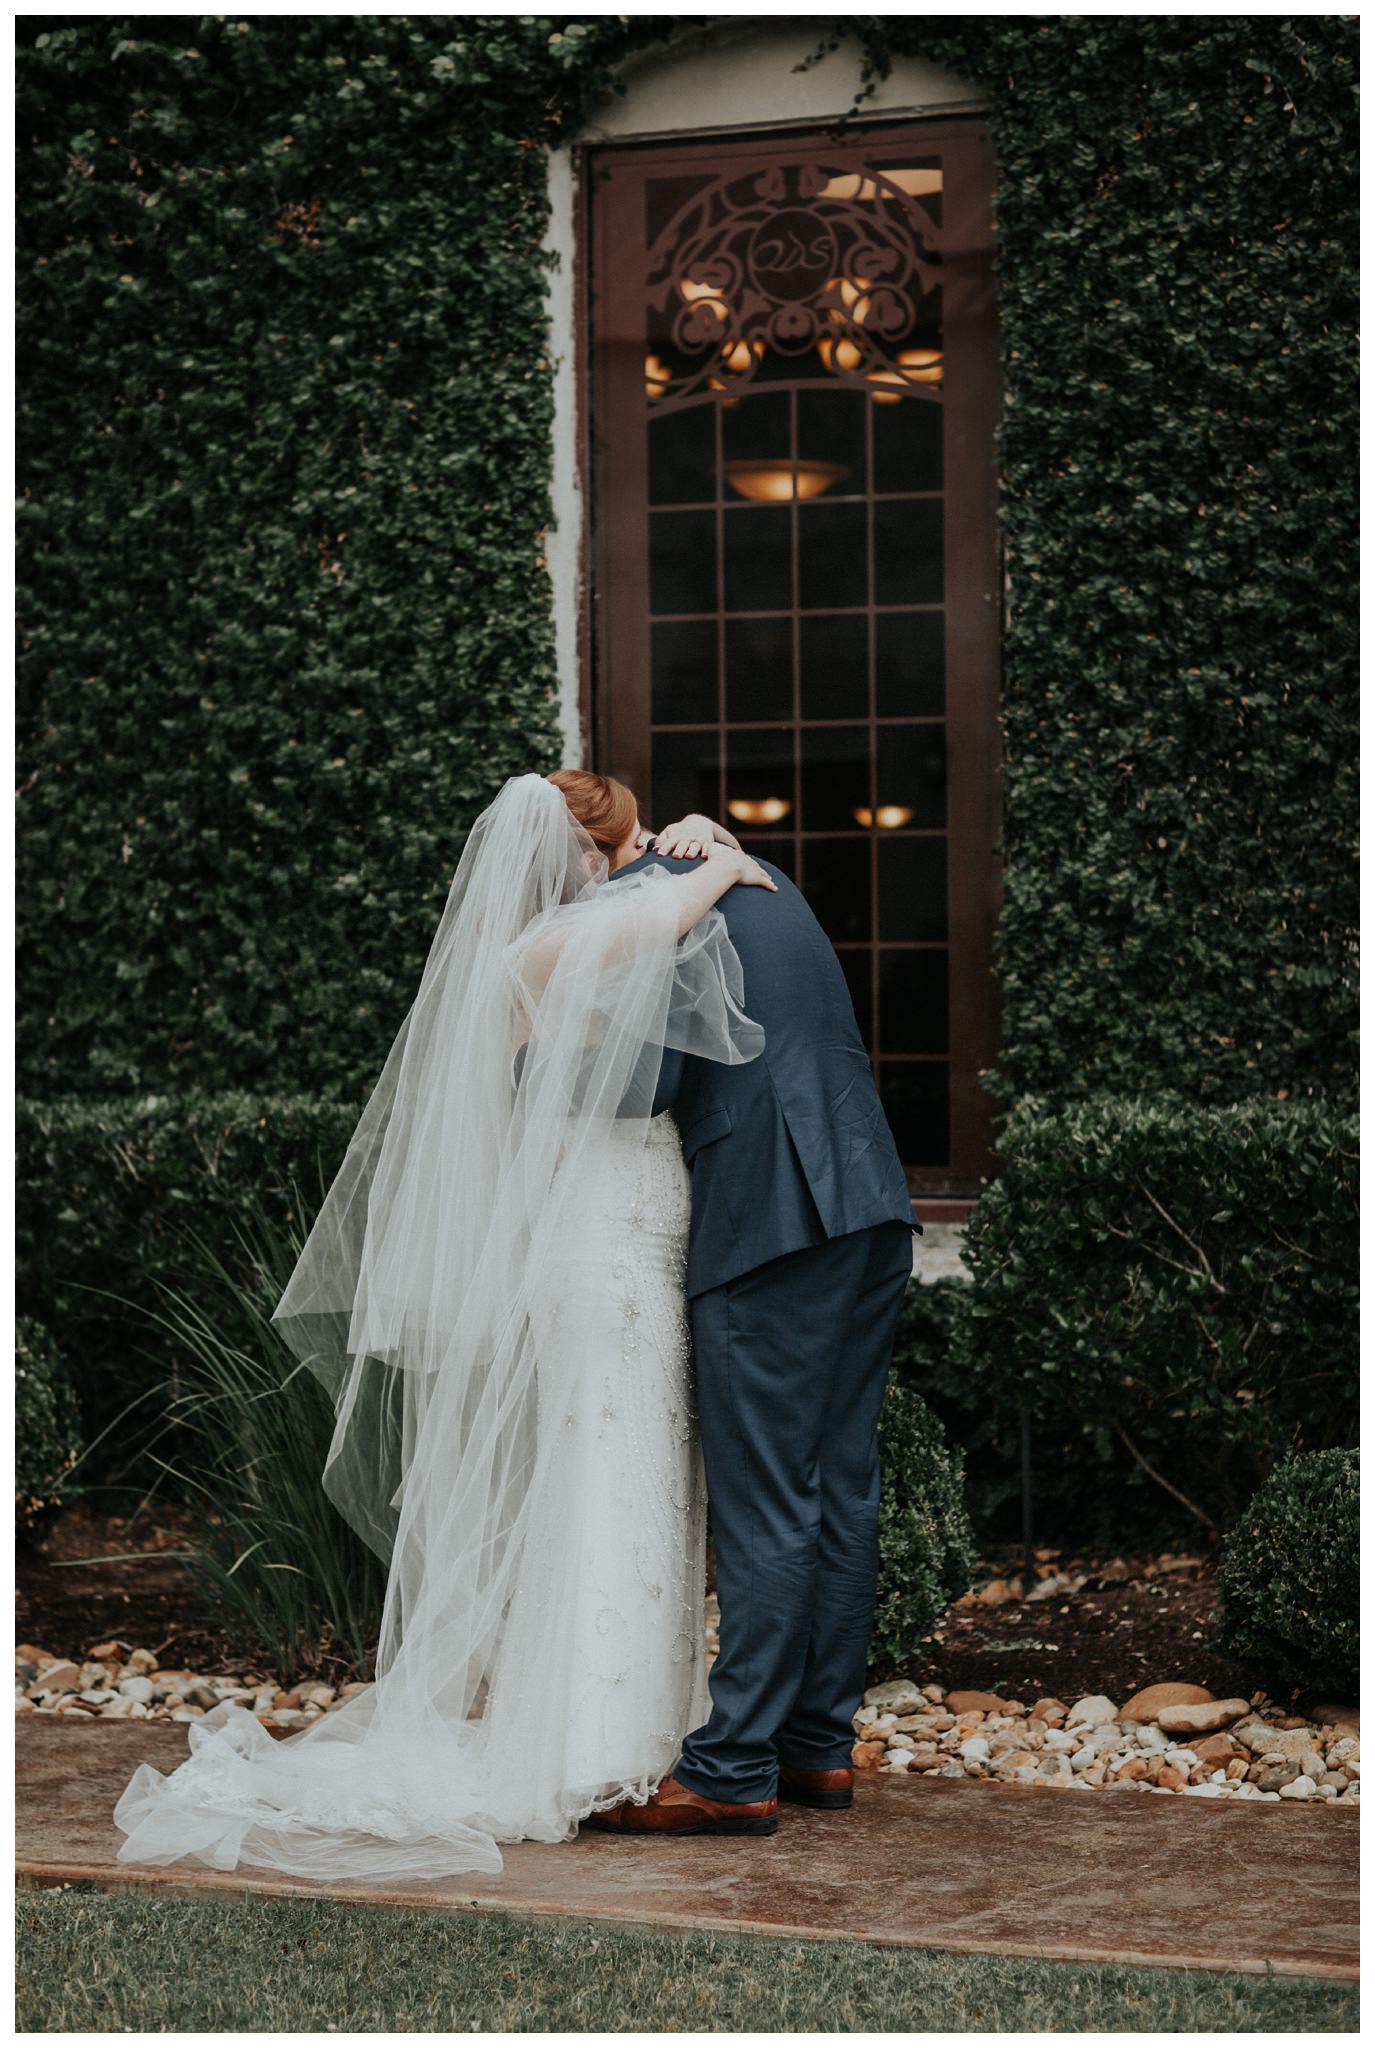 Summertime Olde Dobbin Station - Magnolia Wedding - The Woodlands Texas Wedding Photographer-2121.jpg